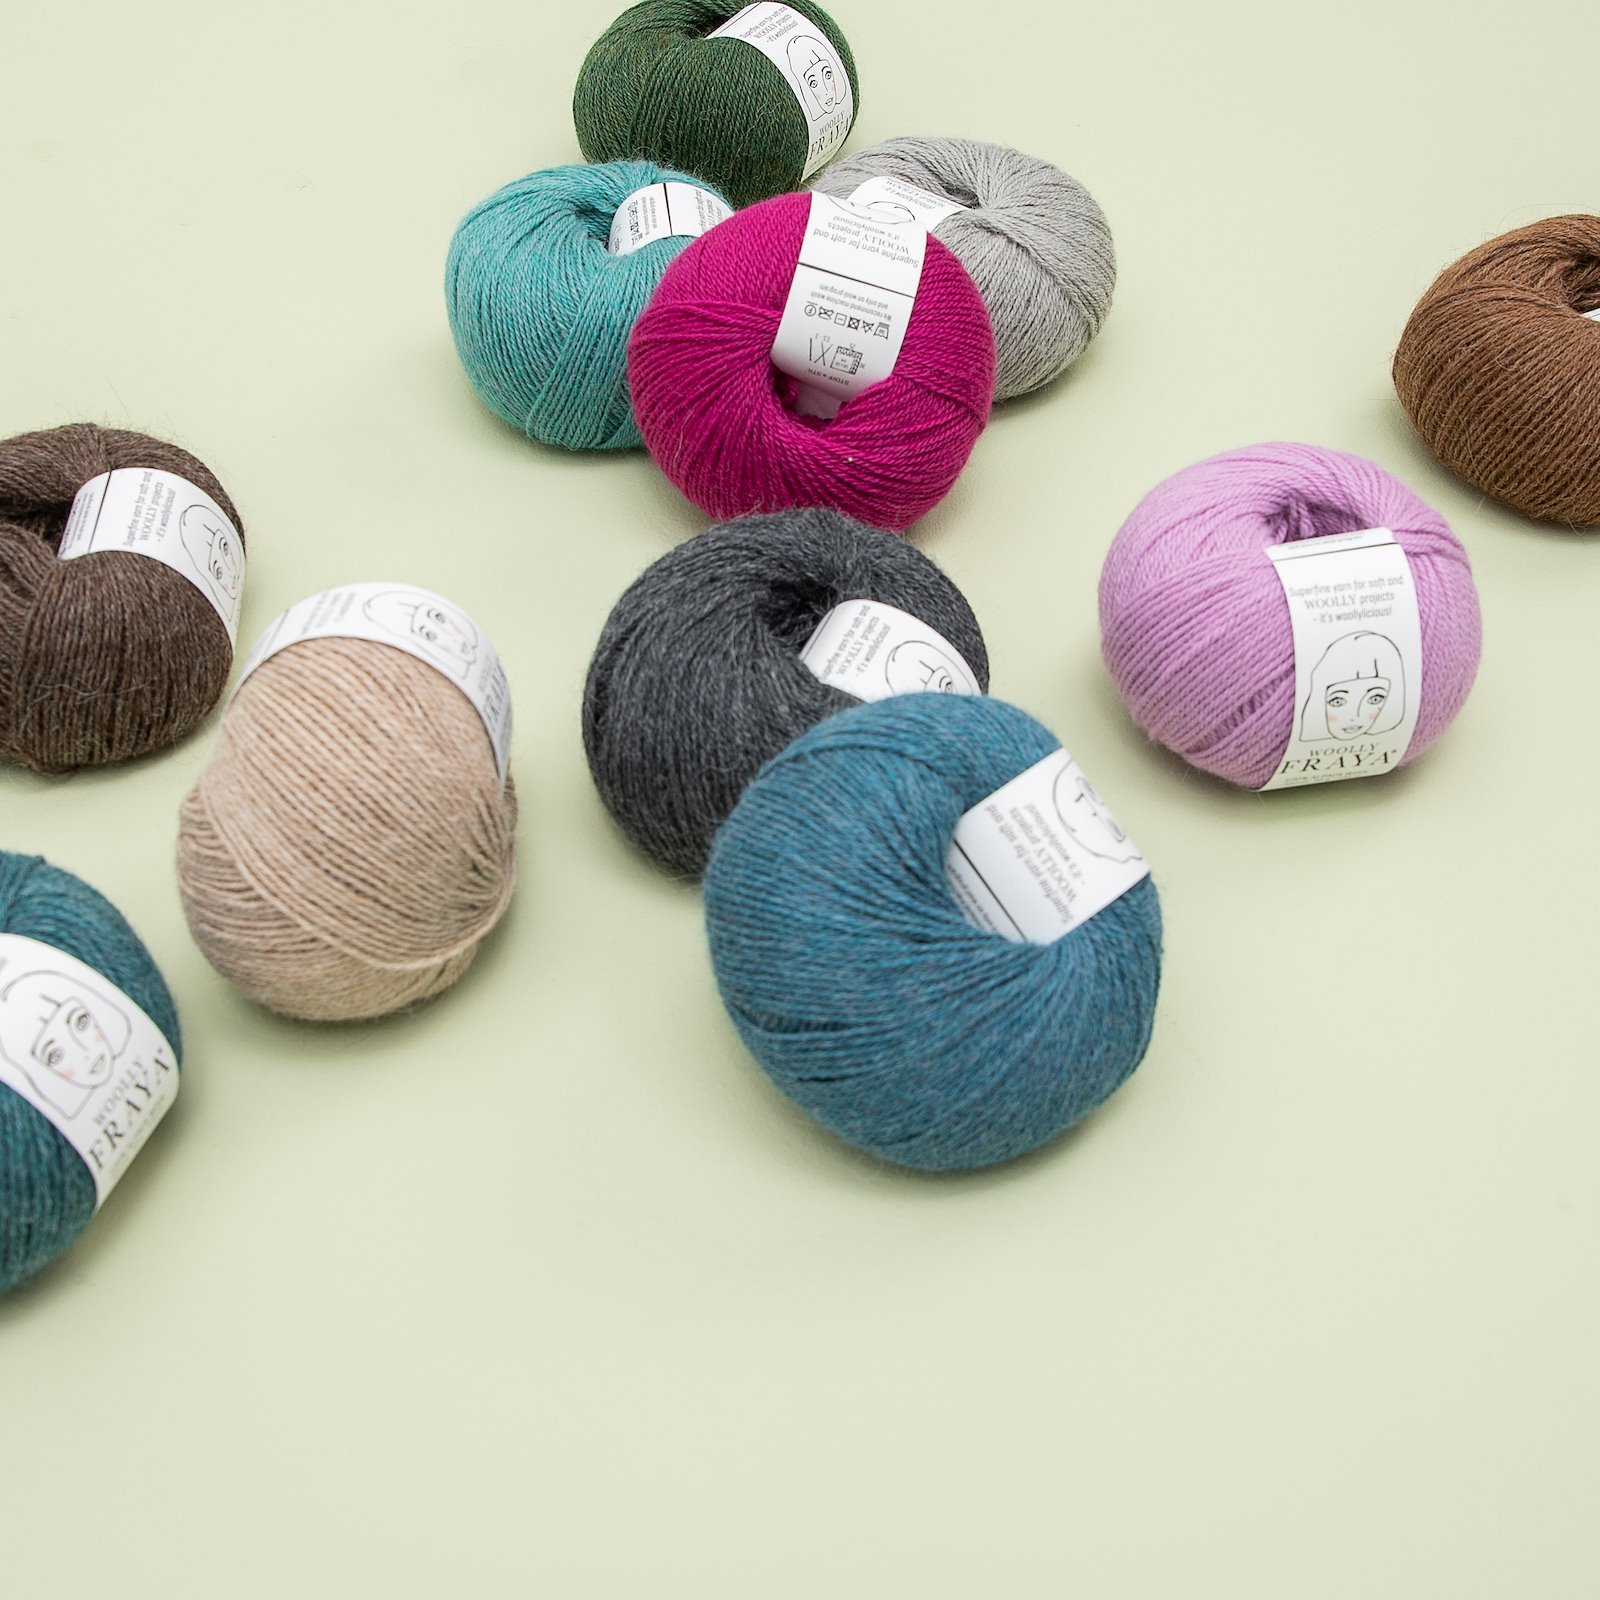 Woolly 50g lilac 90000071_90000072_90000073_90000079_90000080_bundle